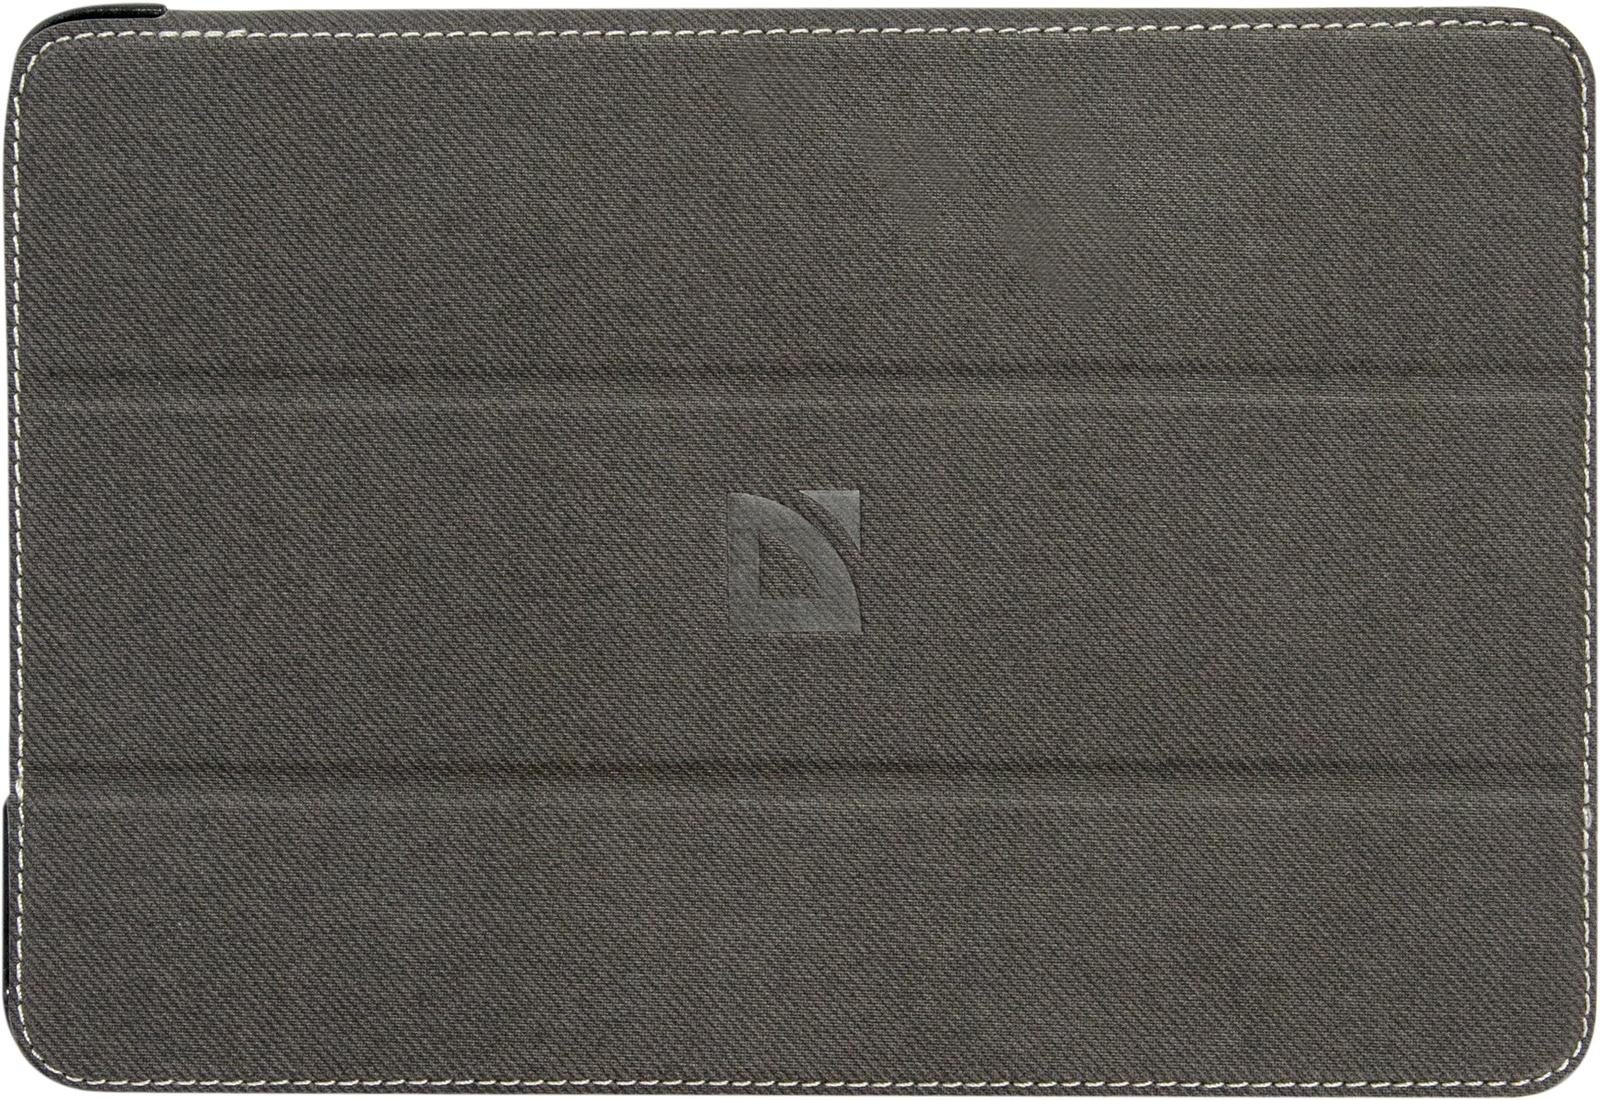 Чехол для планшета Defender Mini case, 26044 цена